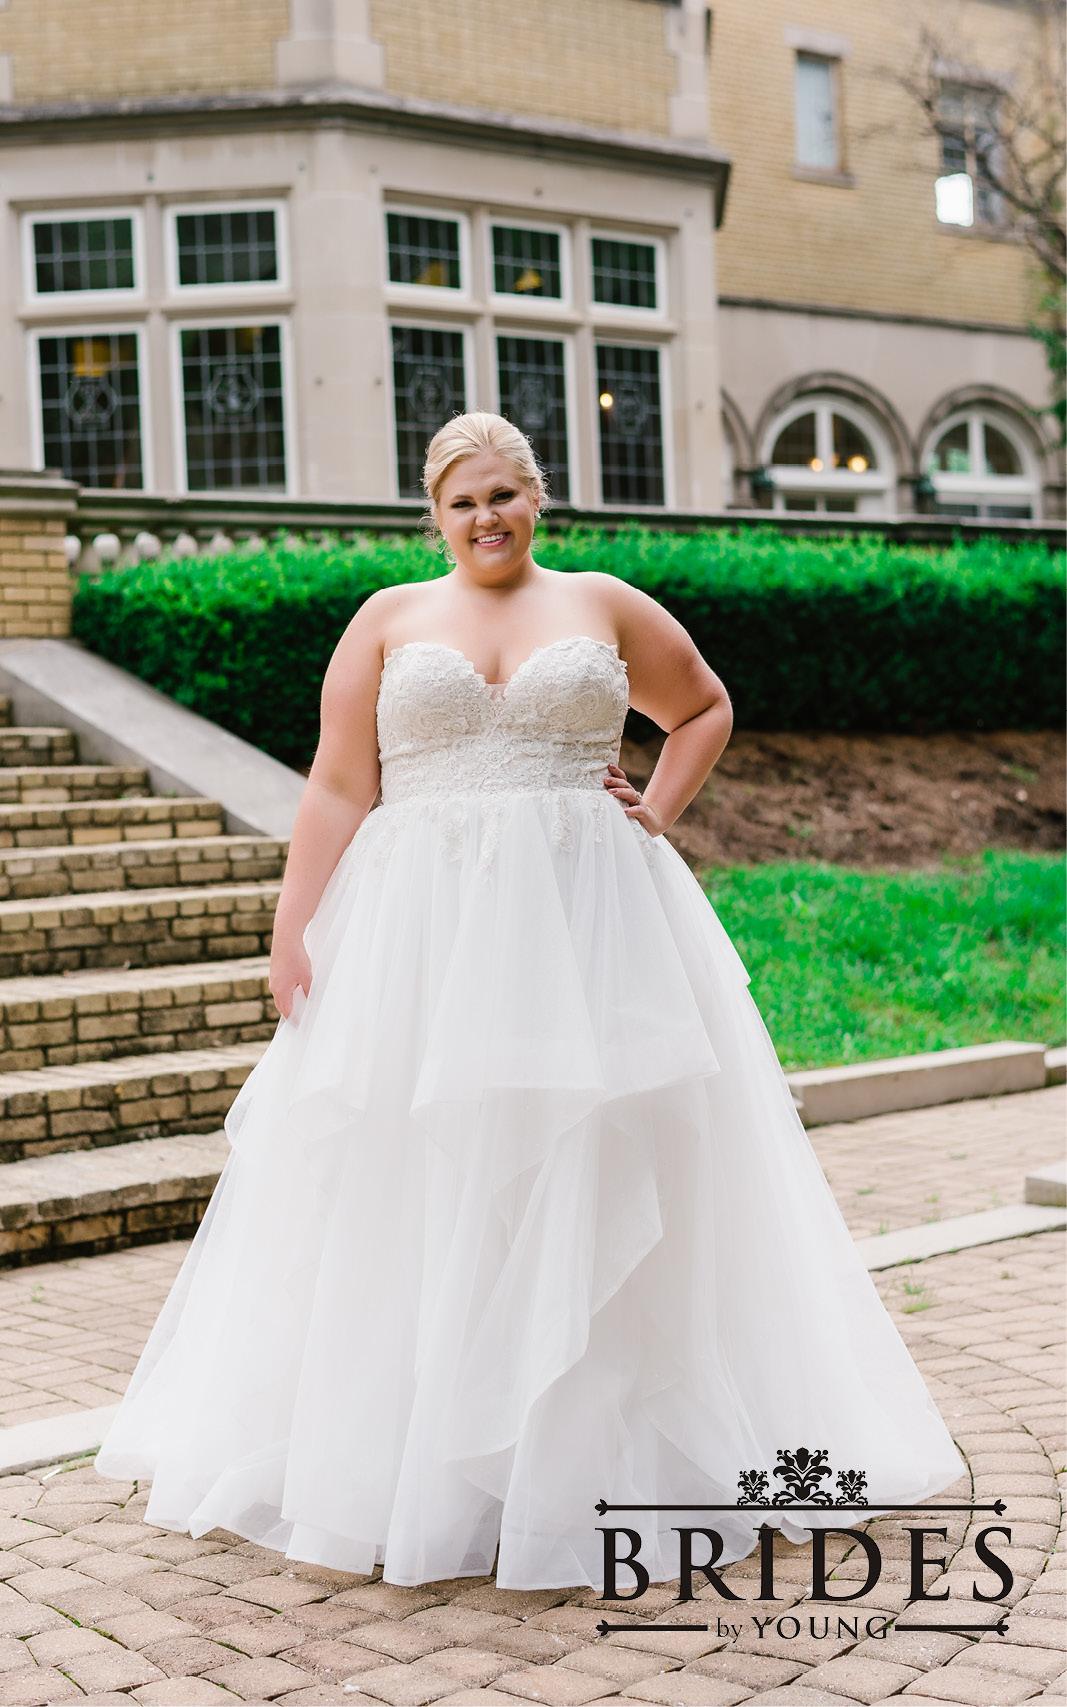 BridesbyYoung-2020Collection-PlusSizeBridalBoutique-CurvyWeddingDressInspiration-105.jpg